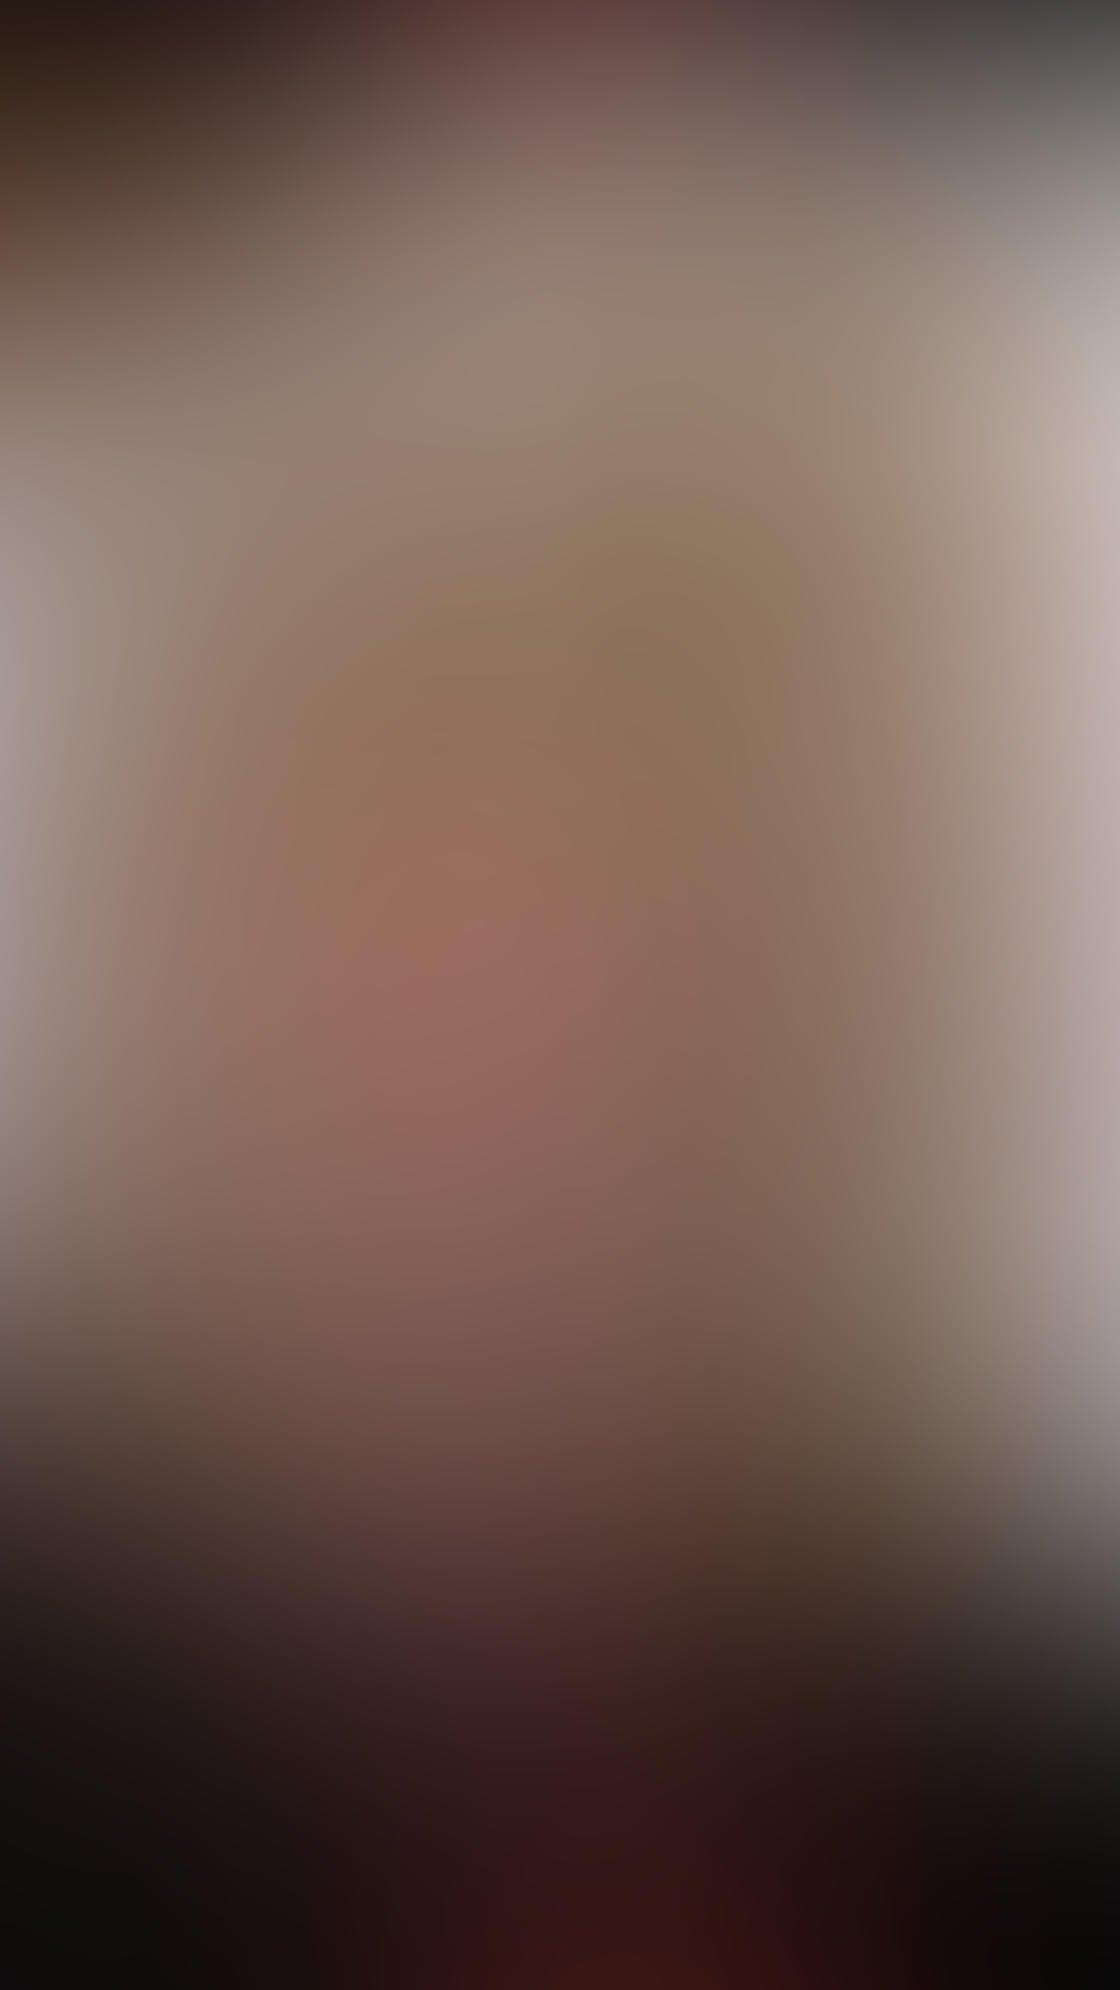 Procamera app selfie mode 2